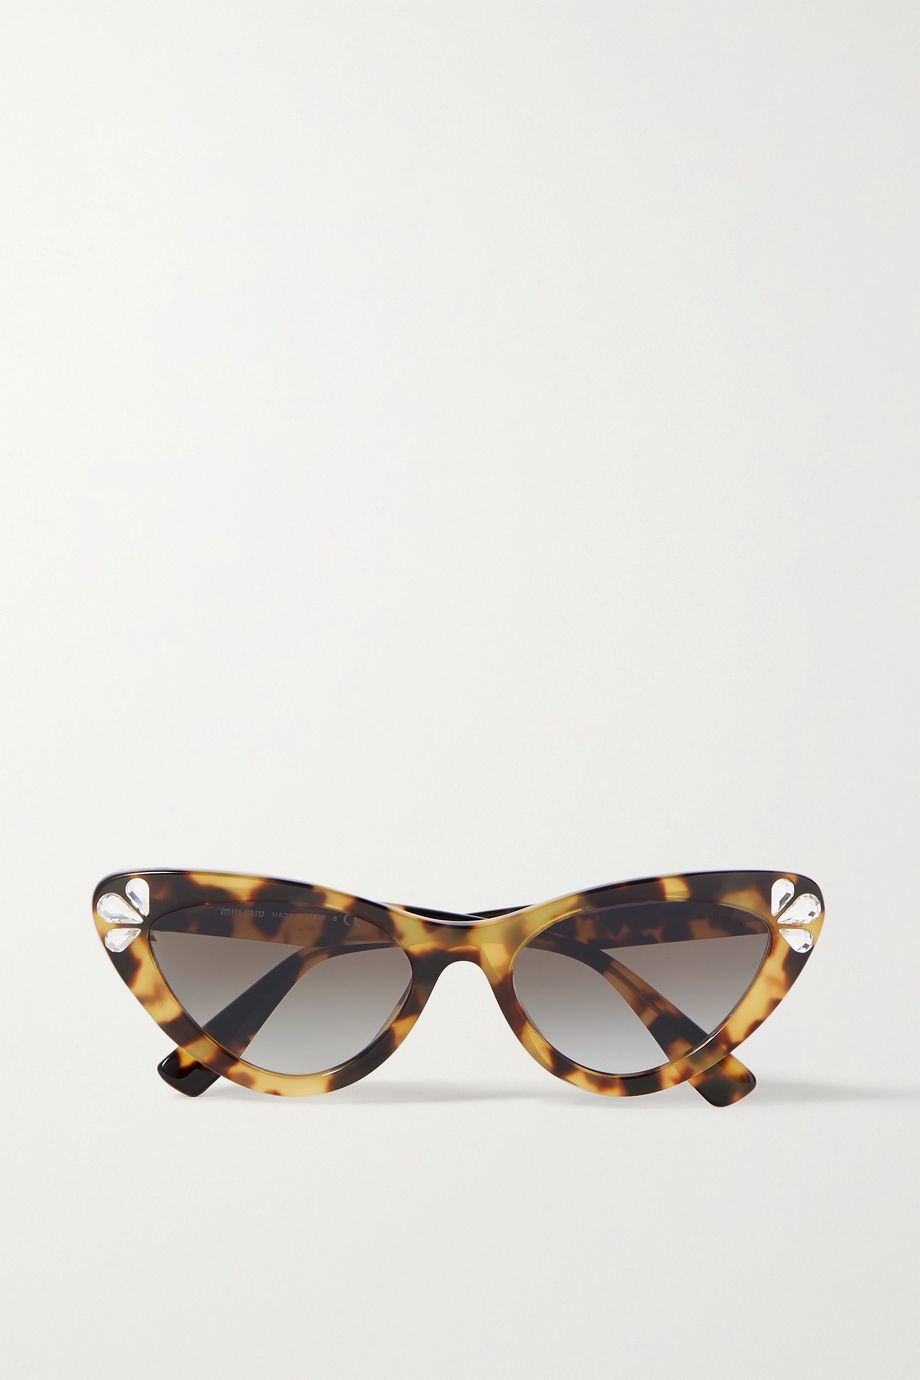 Miu Miu Eyewear Cat-eye crystal-embellished tortoiseshell acetate sunglasses